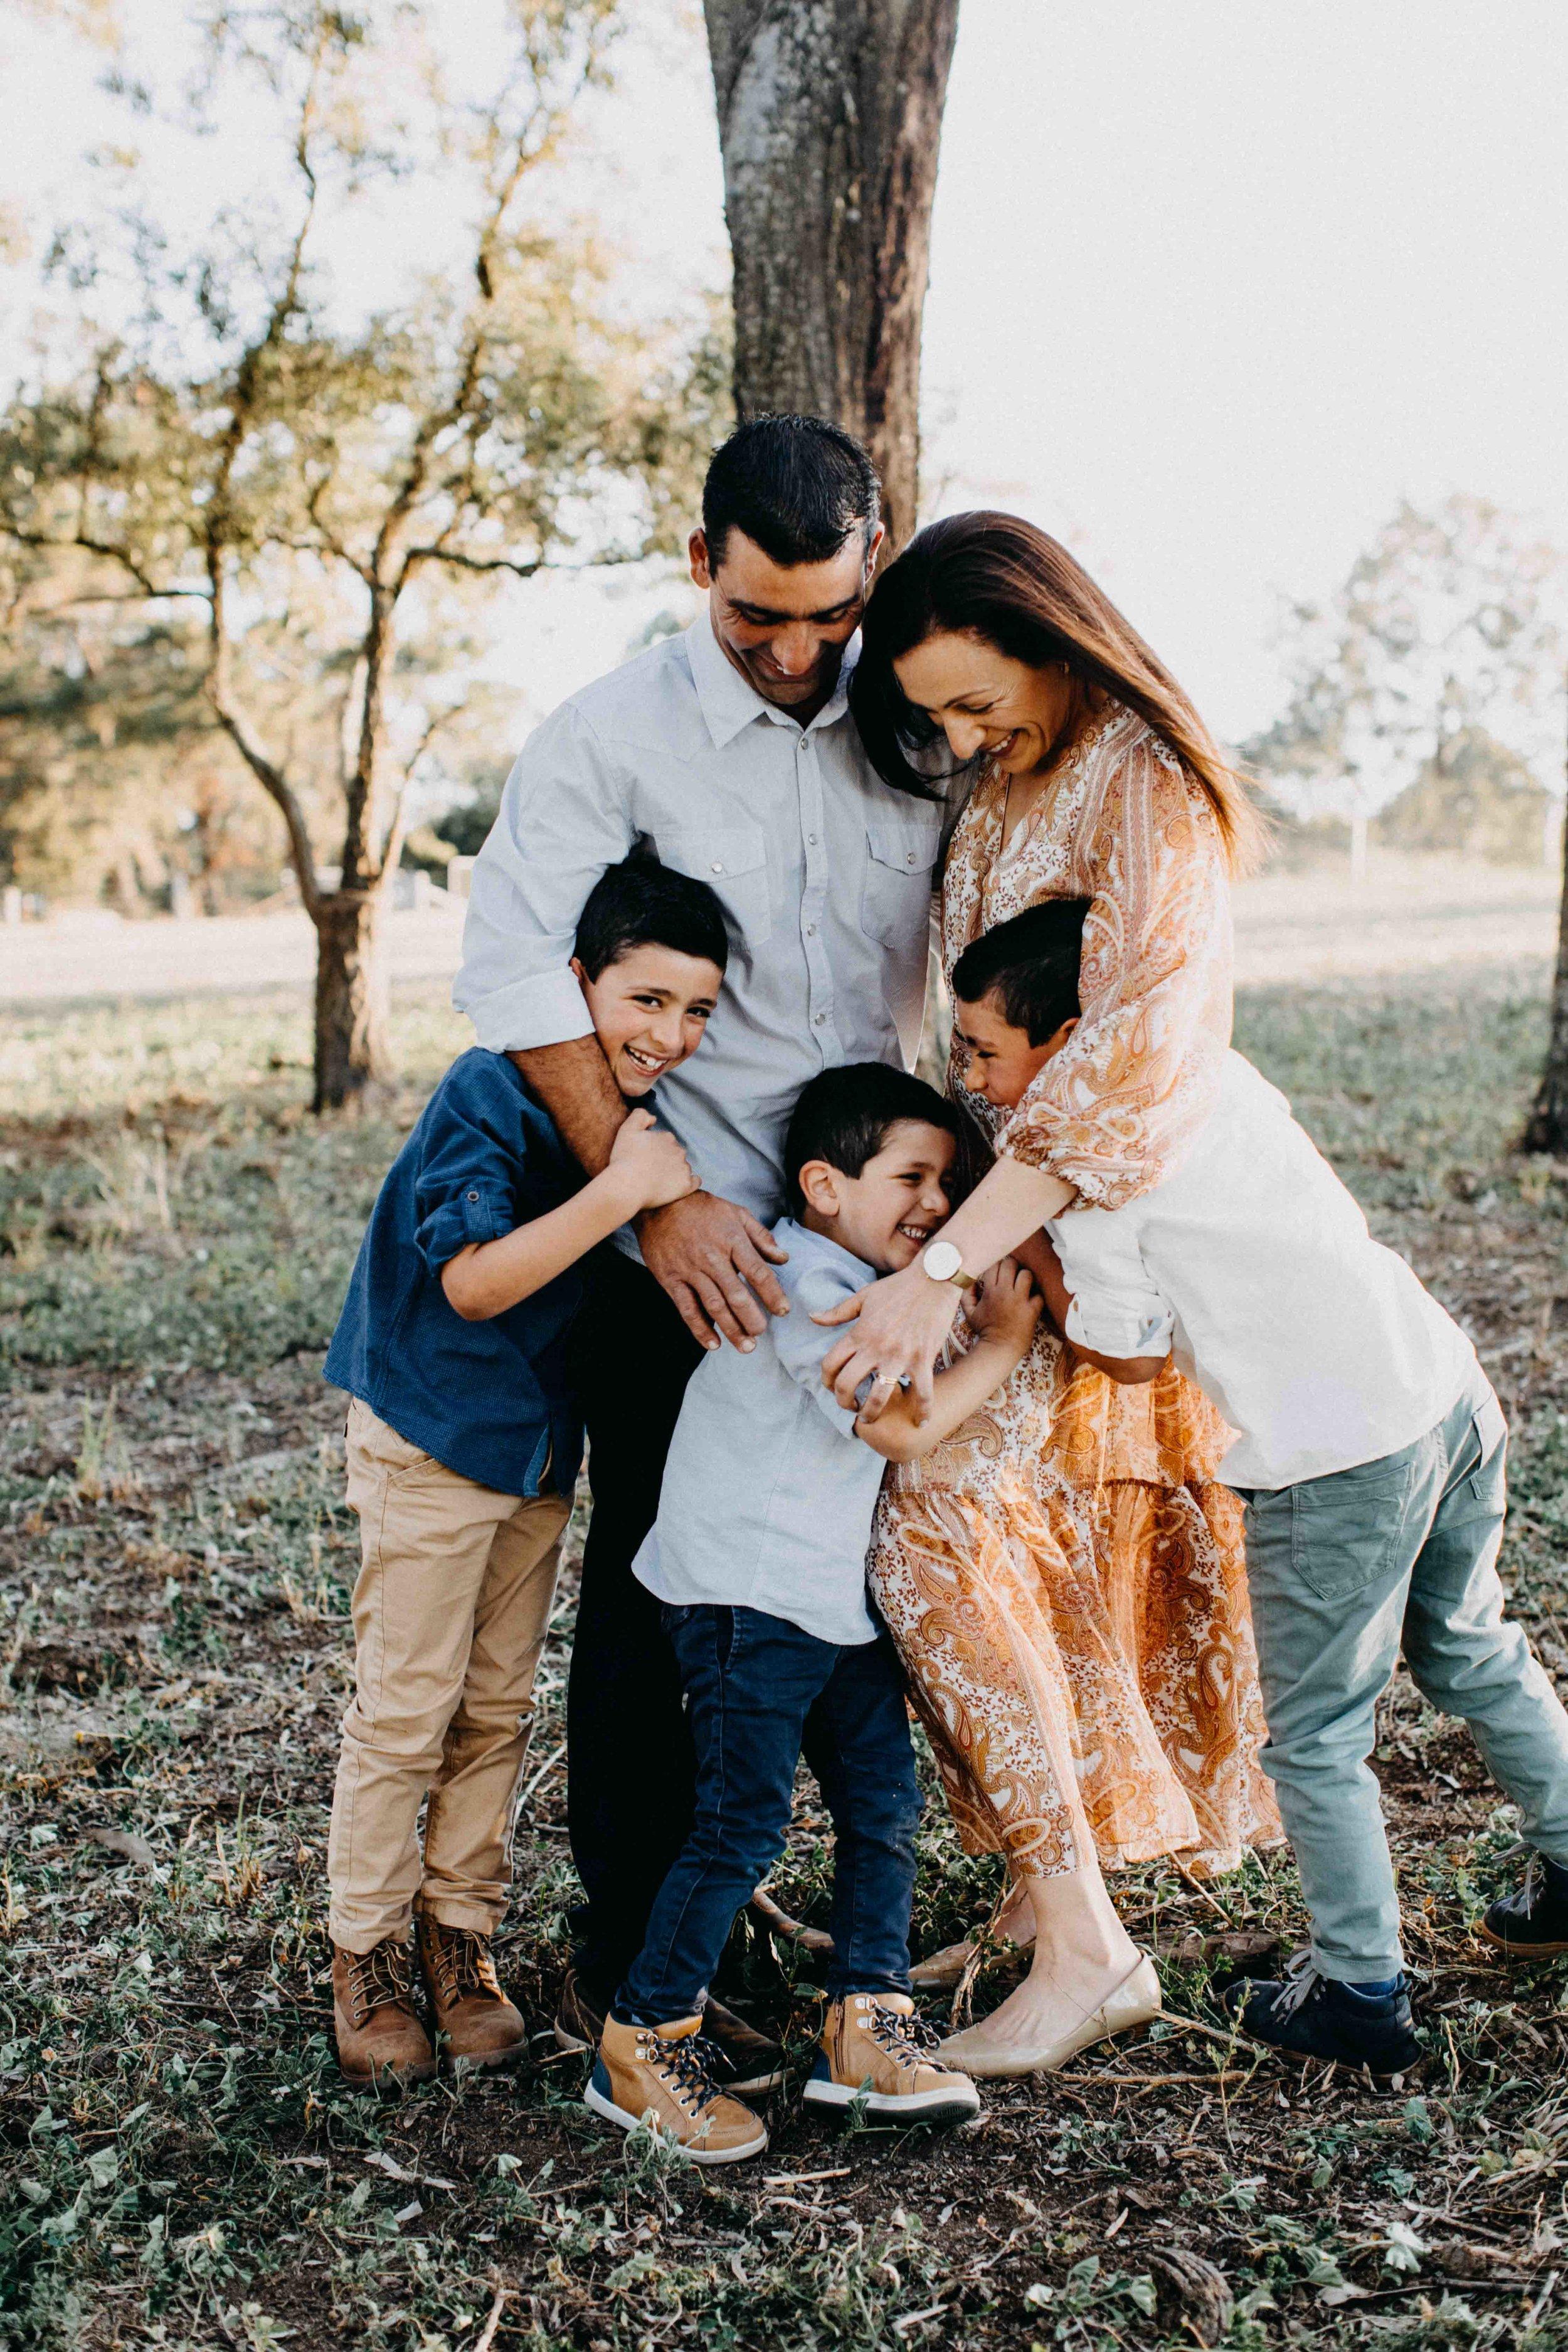 camden-family-photography-galea-www.emilyobrienphotography.net-6.jpg